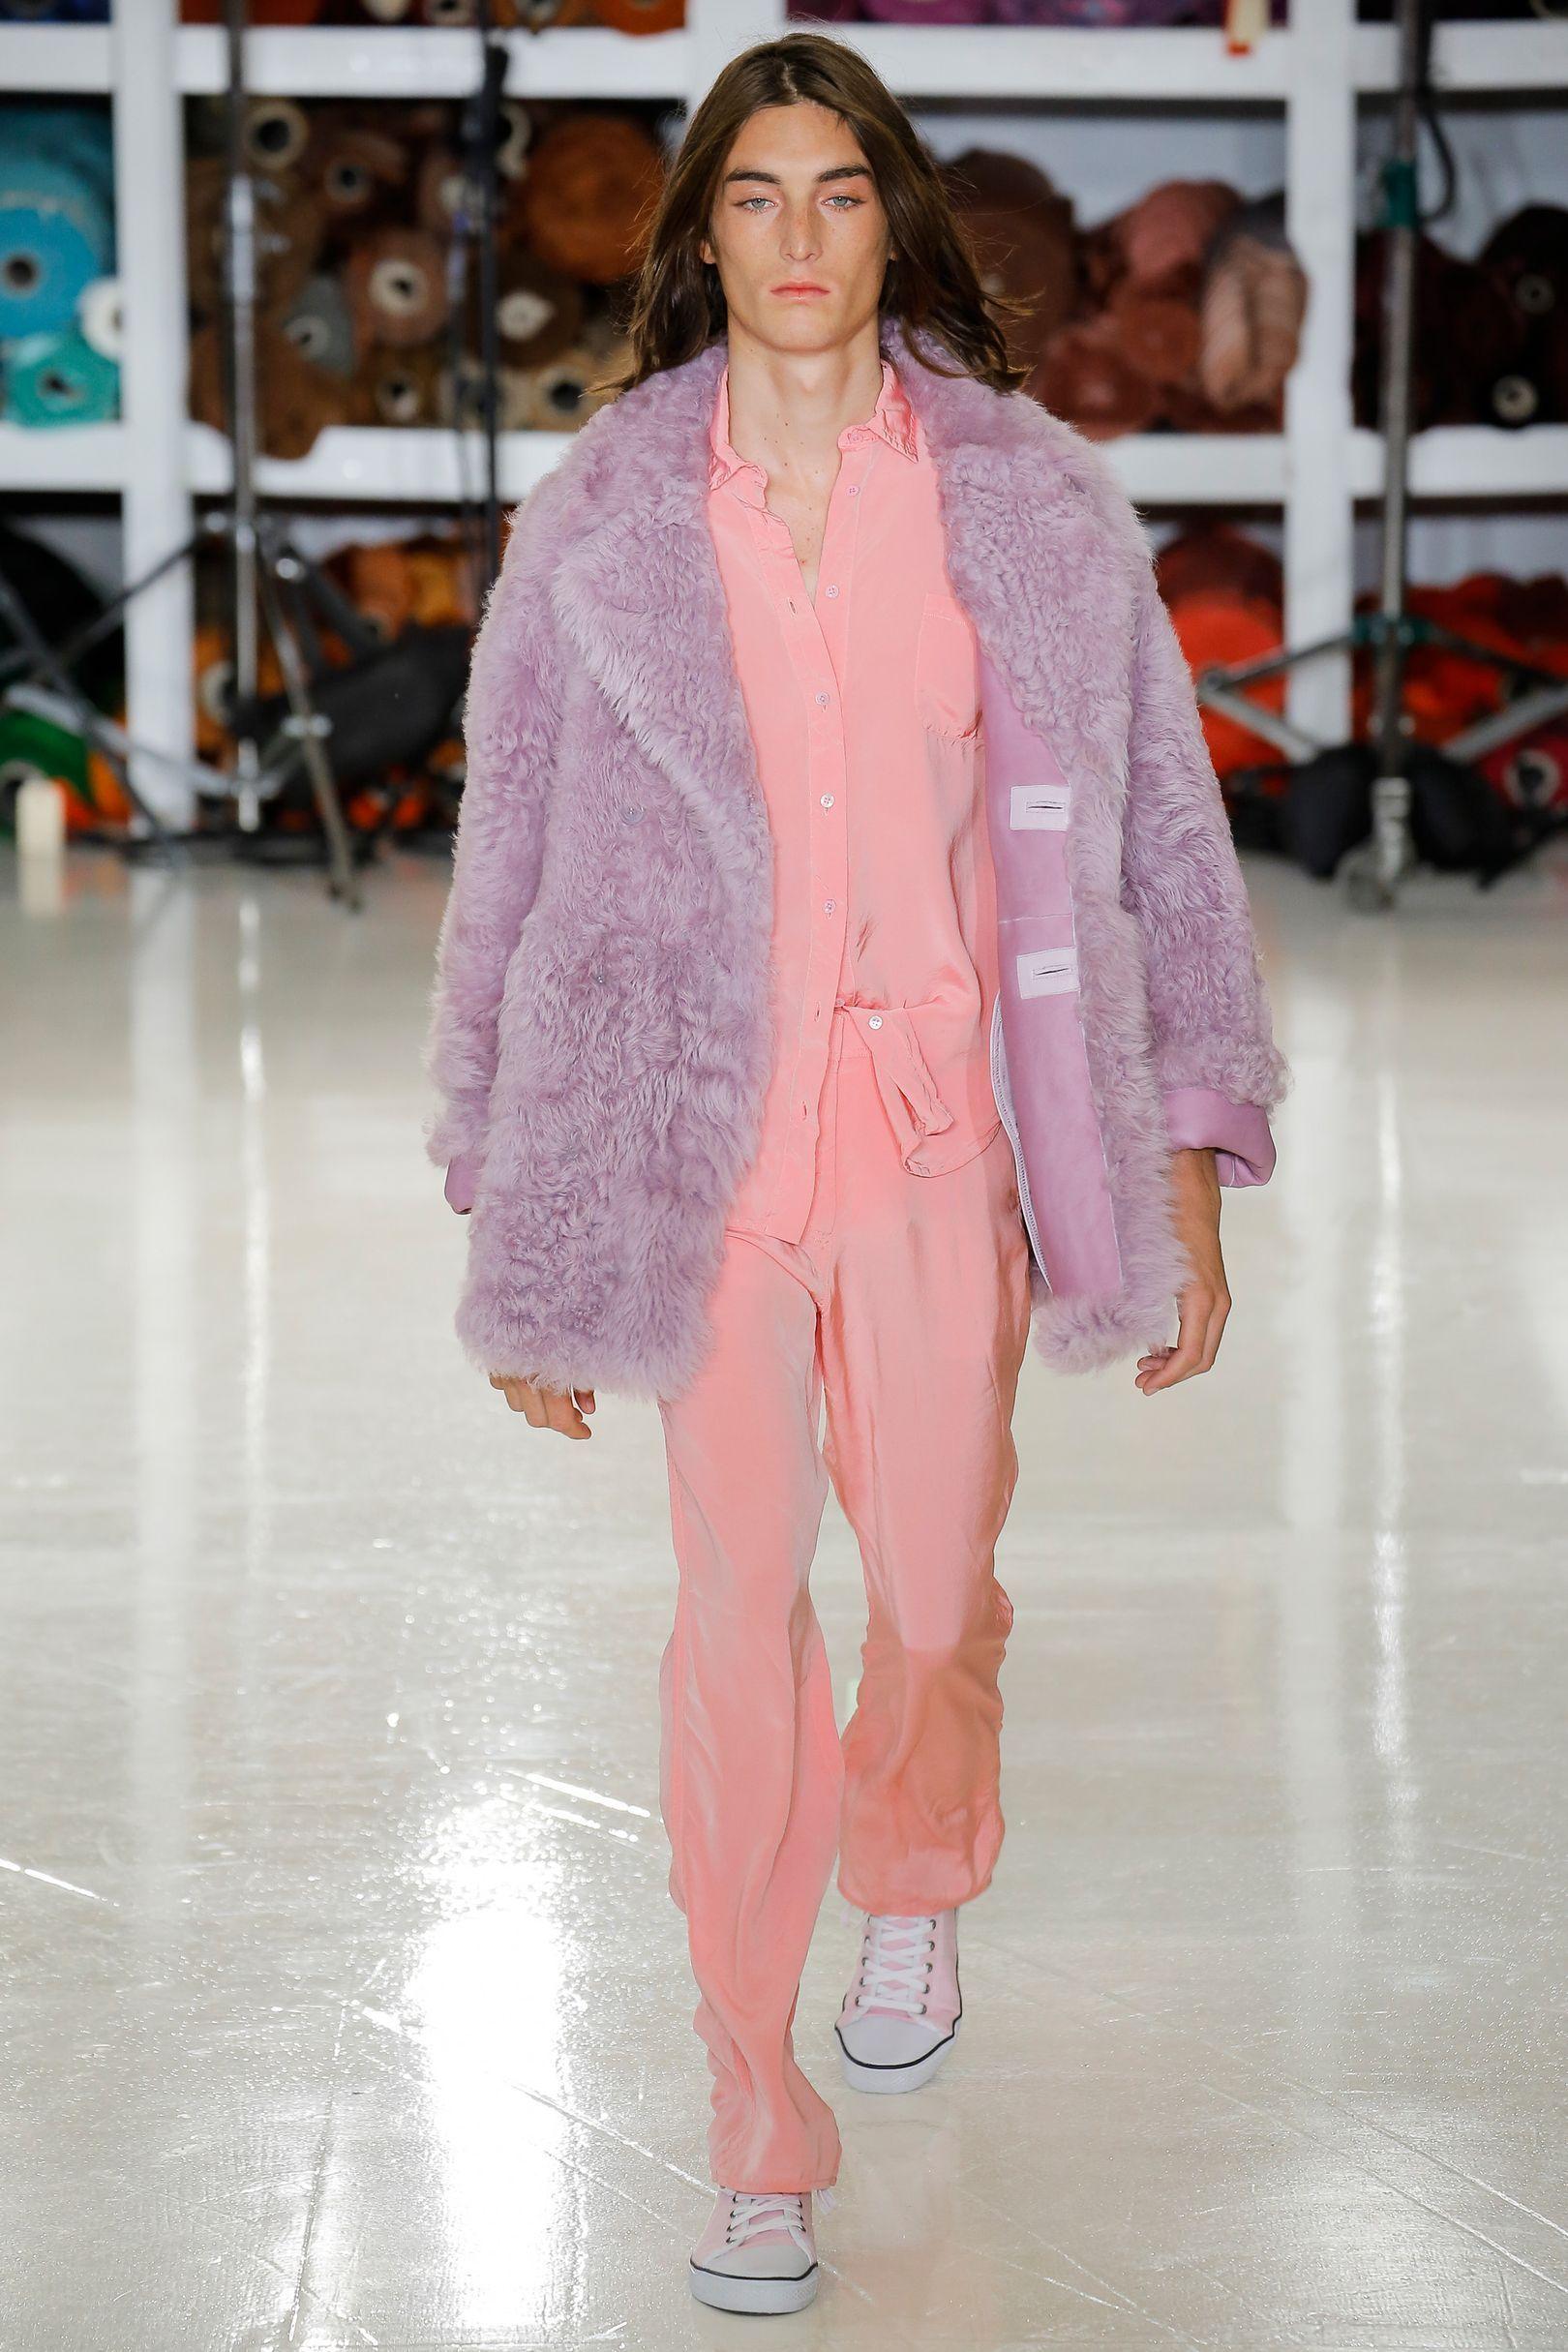 Fashion Spring trend: chic sportswear